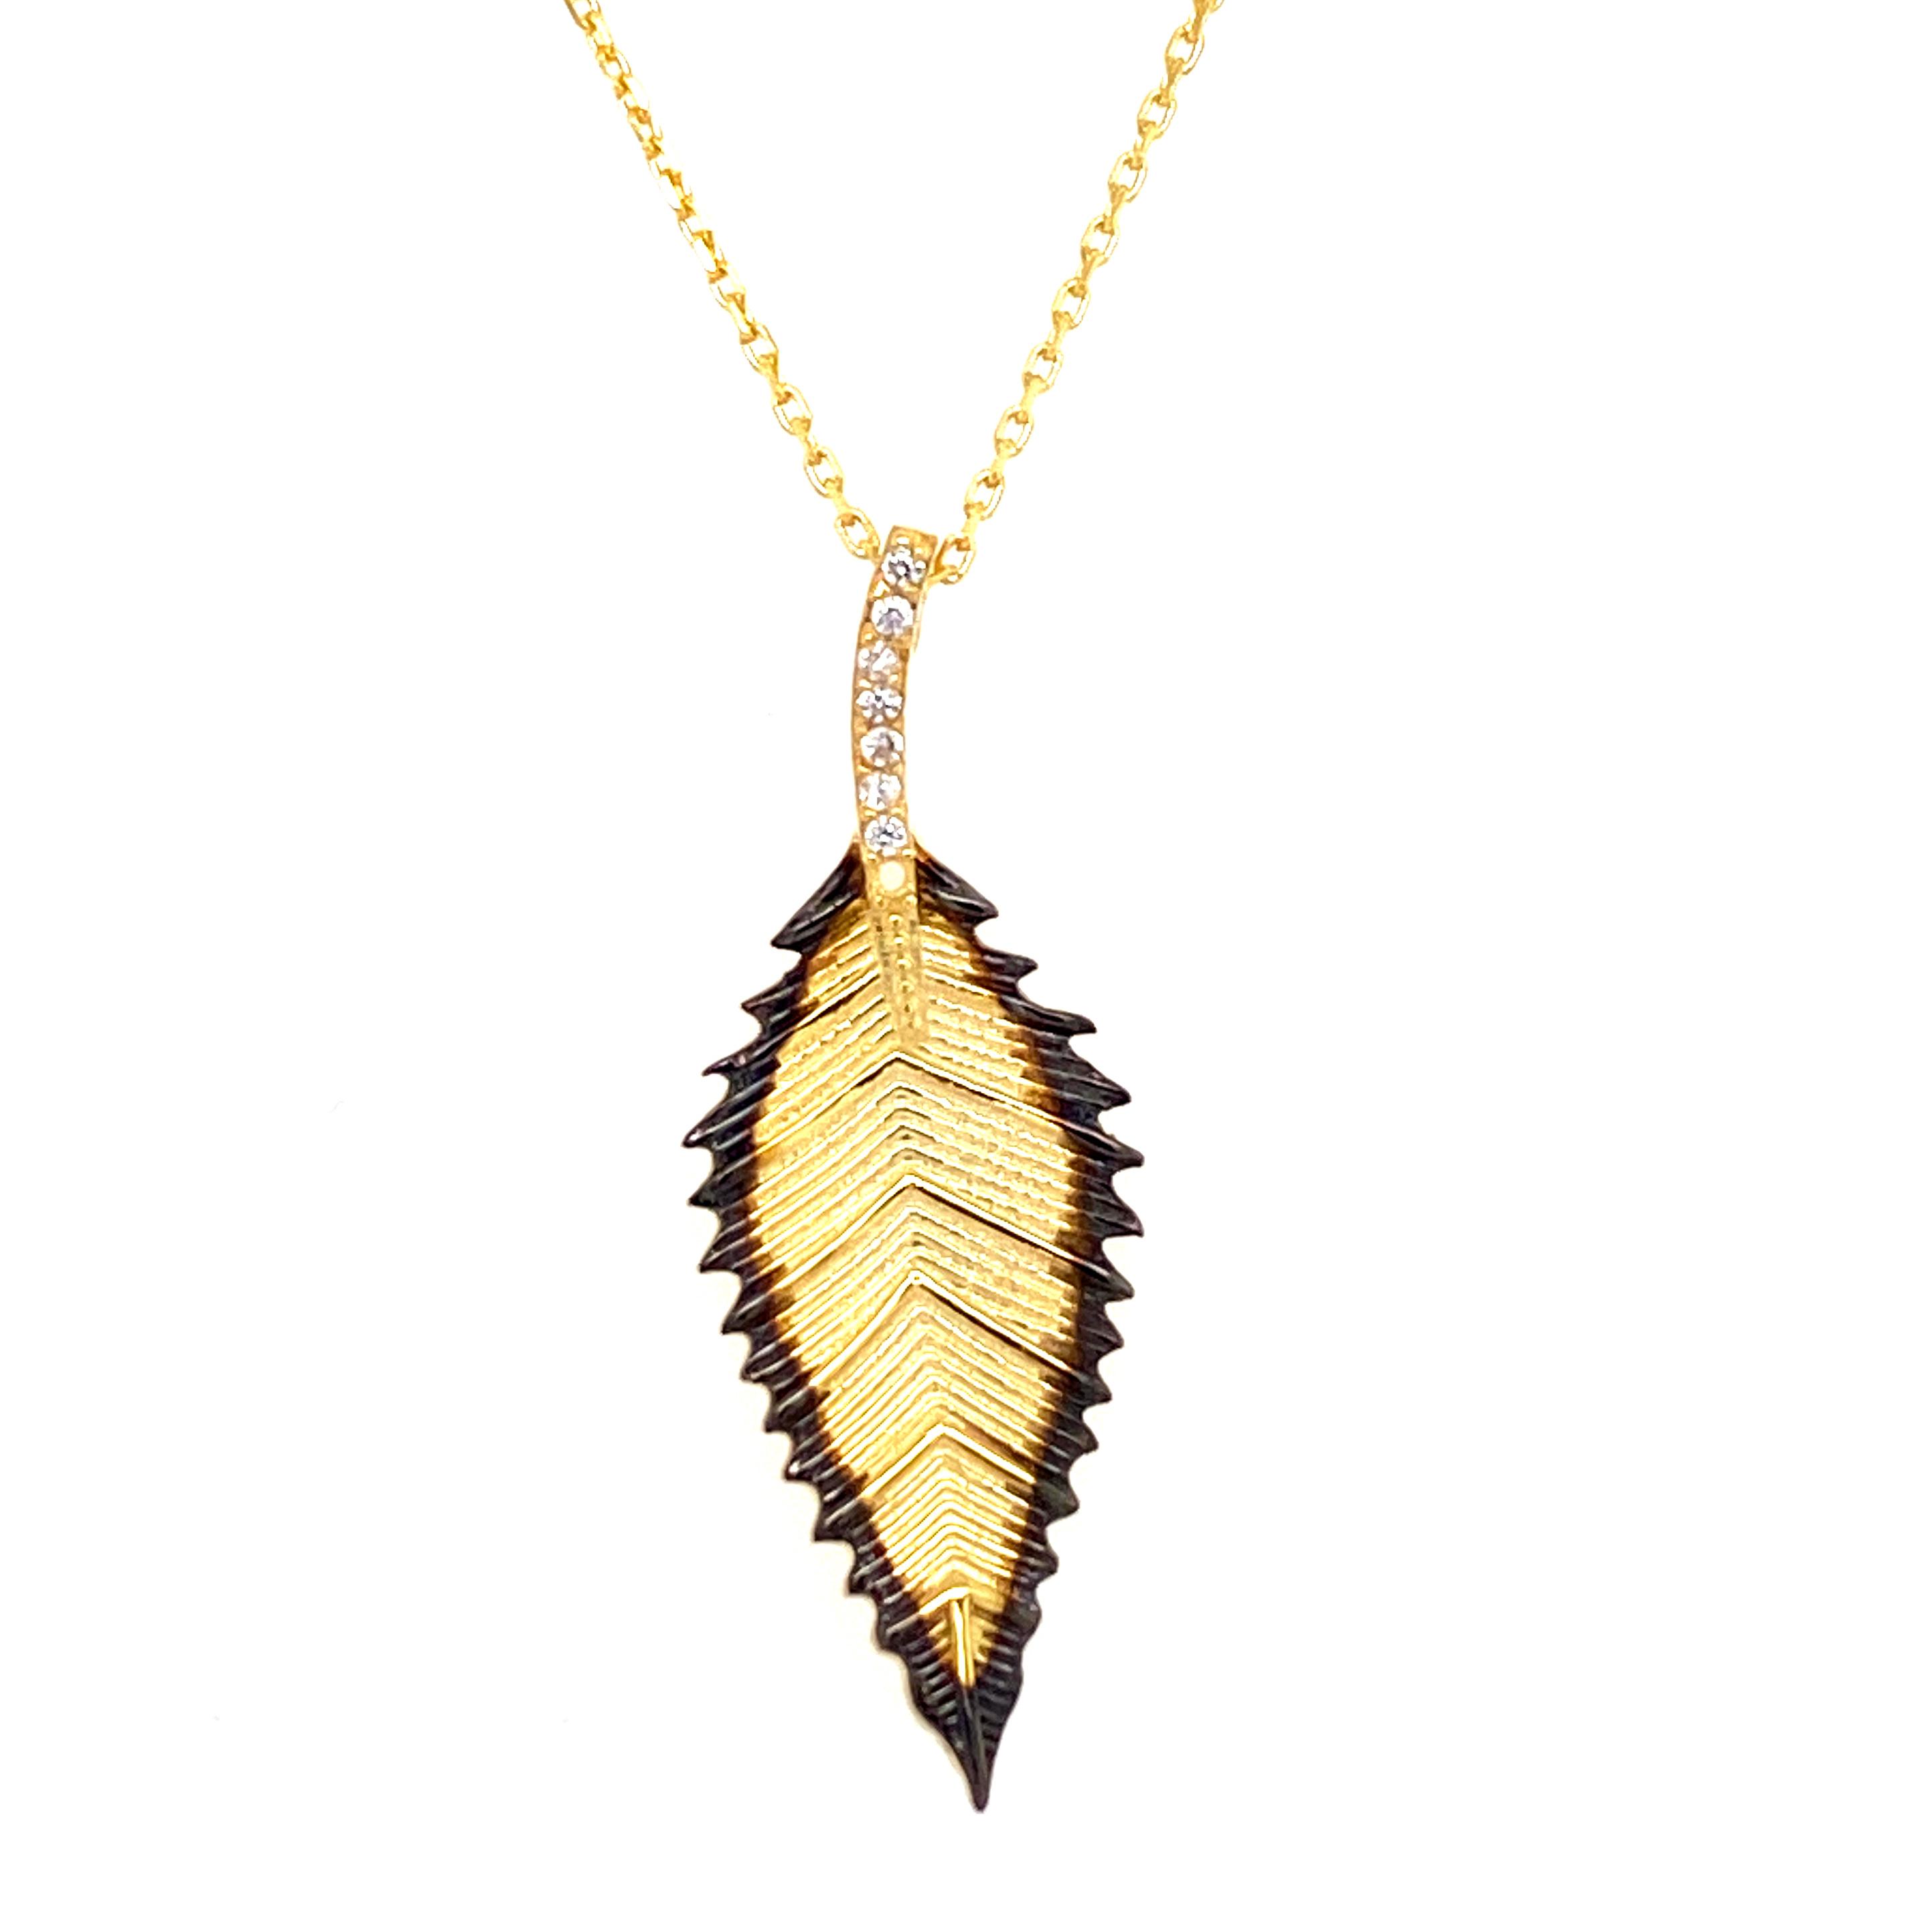 925 Silber Halskette | Blatt Zirkonia